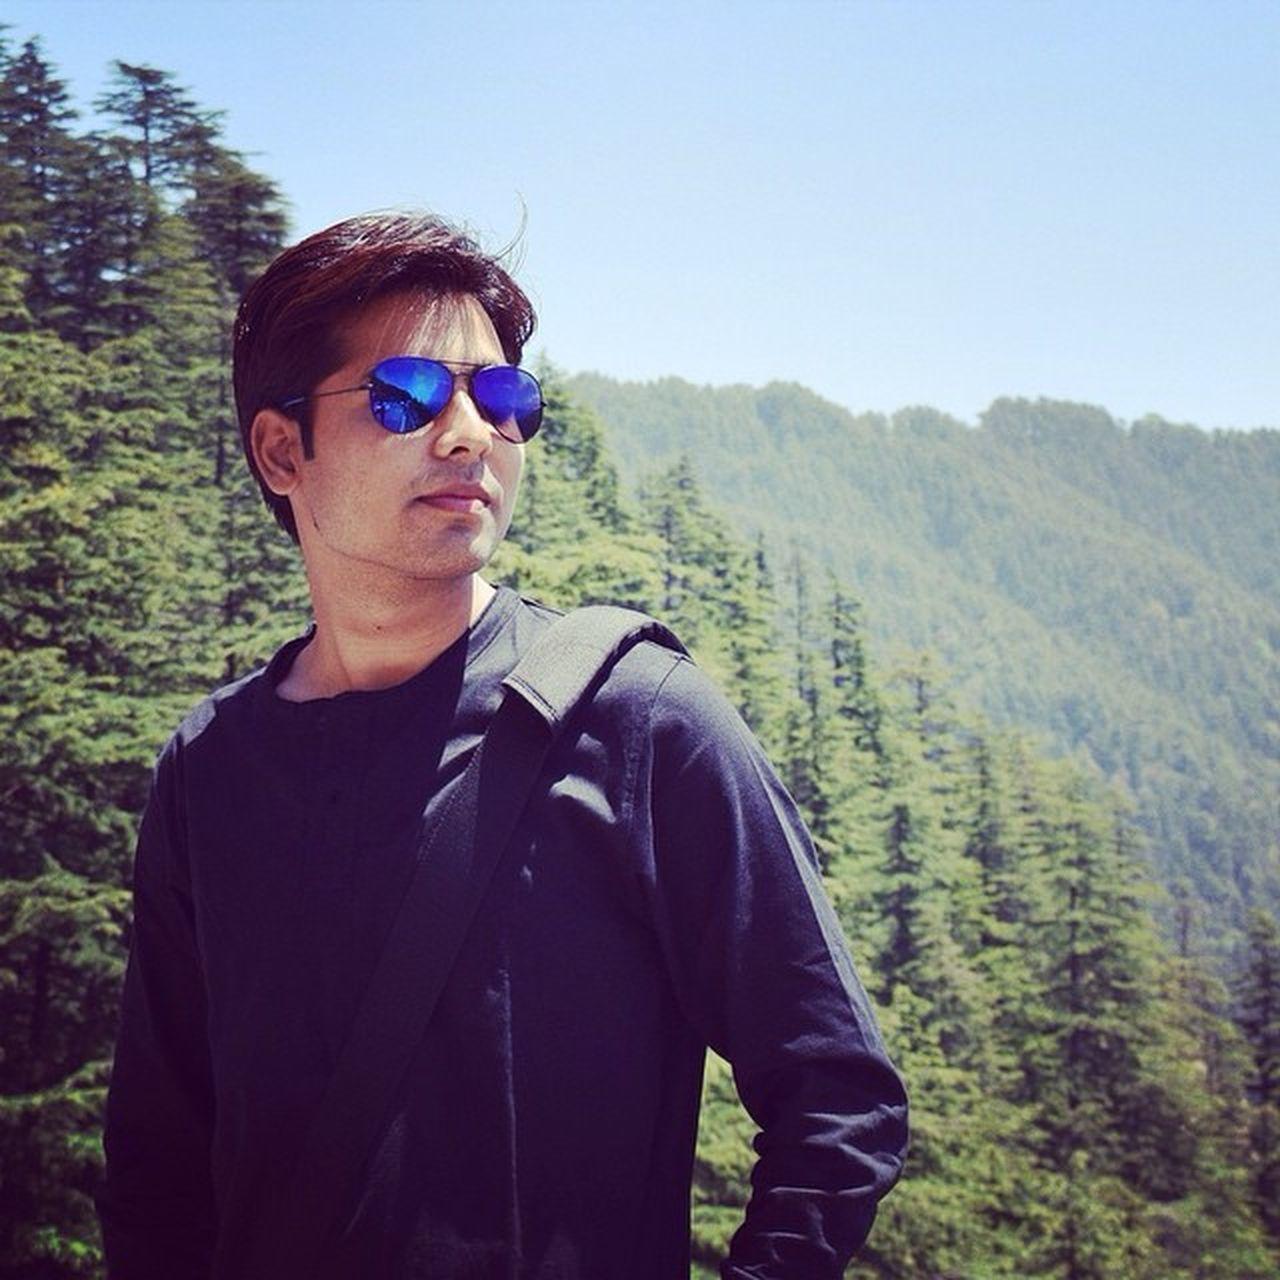 Kufri Instahimachal Shimla Beautiful_Himachal Indian Vincent Blue Aviator Lowepro Mountain Greenery Nature Beauty Nikon D5300 Manishbagari Instahawtties